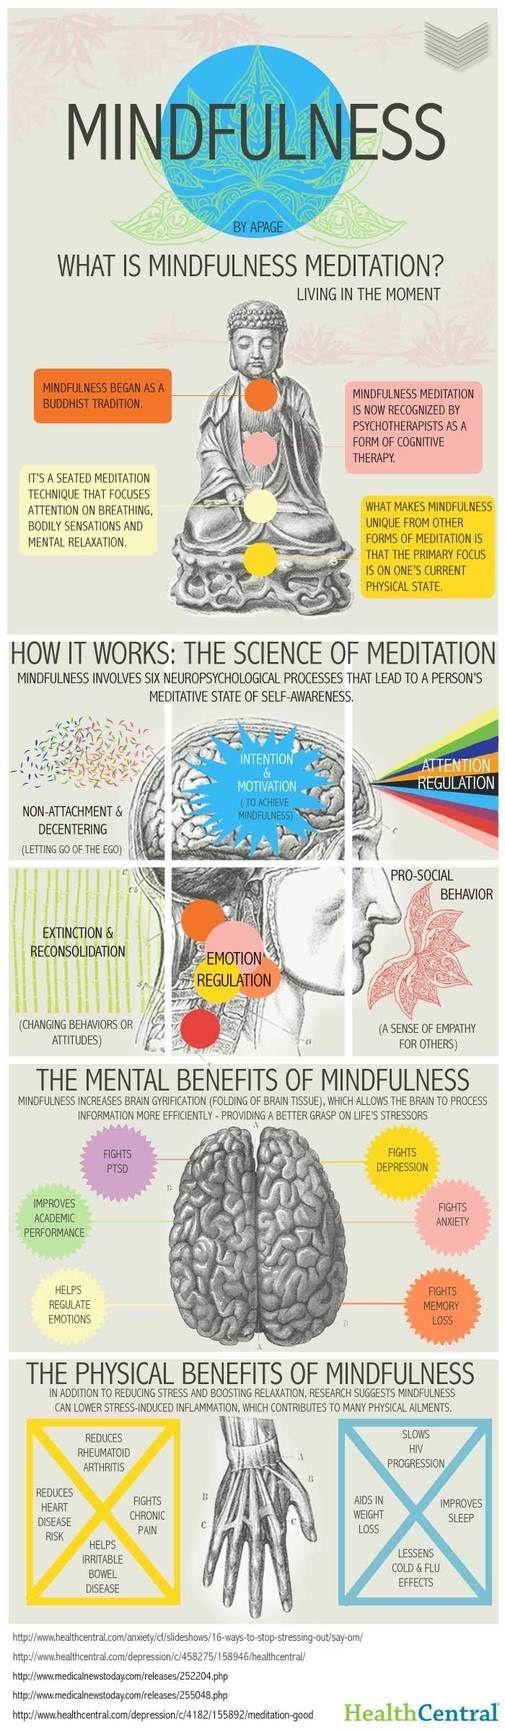 The Mindfulness of Meditation